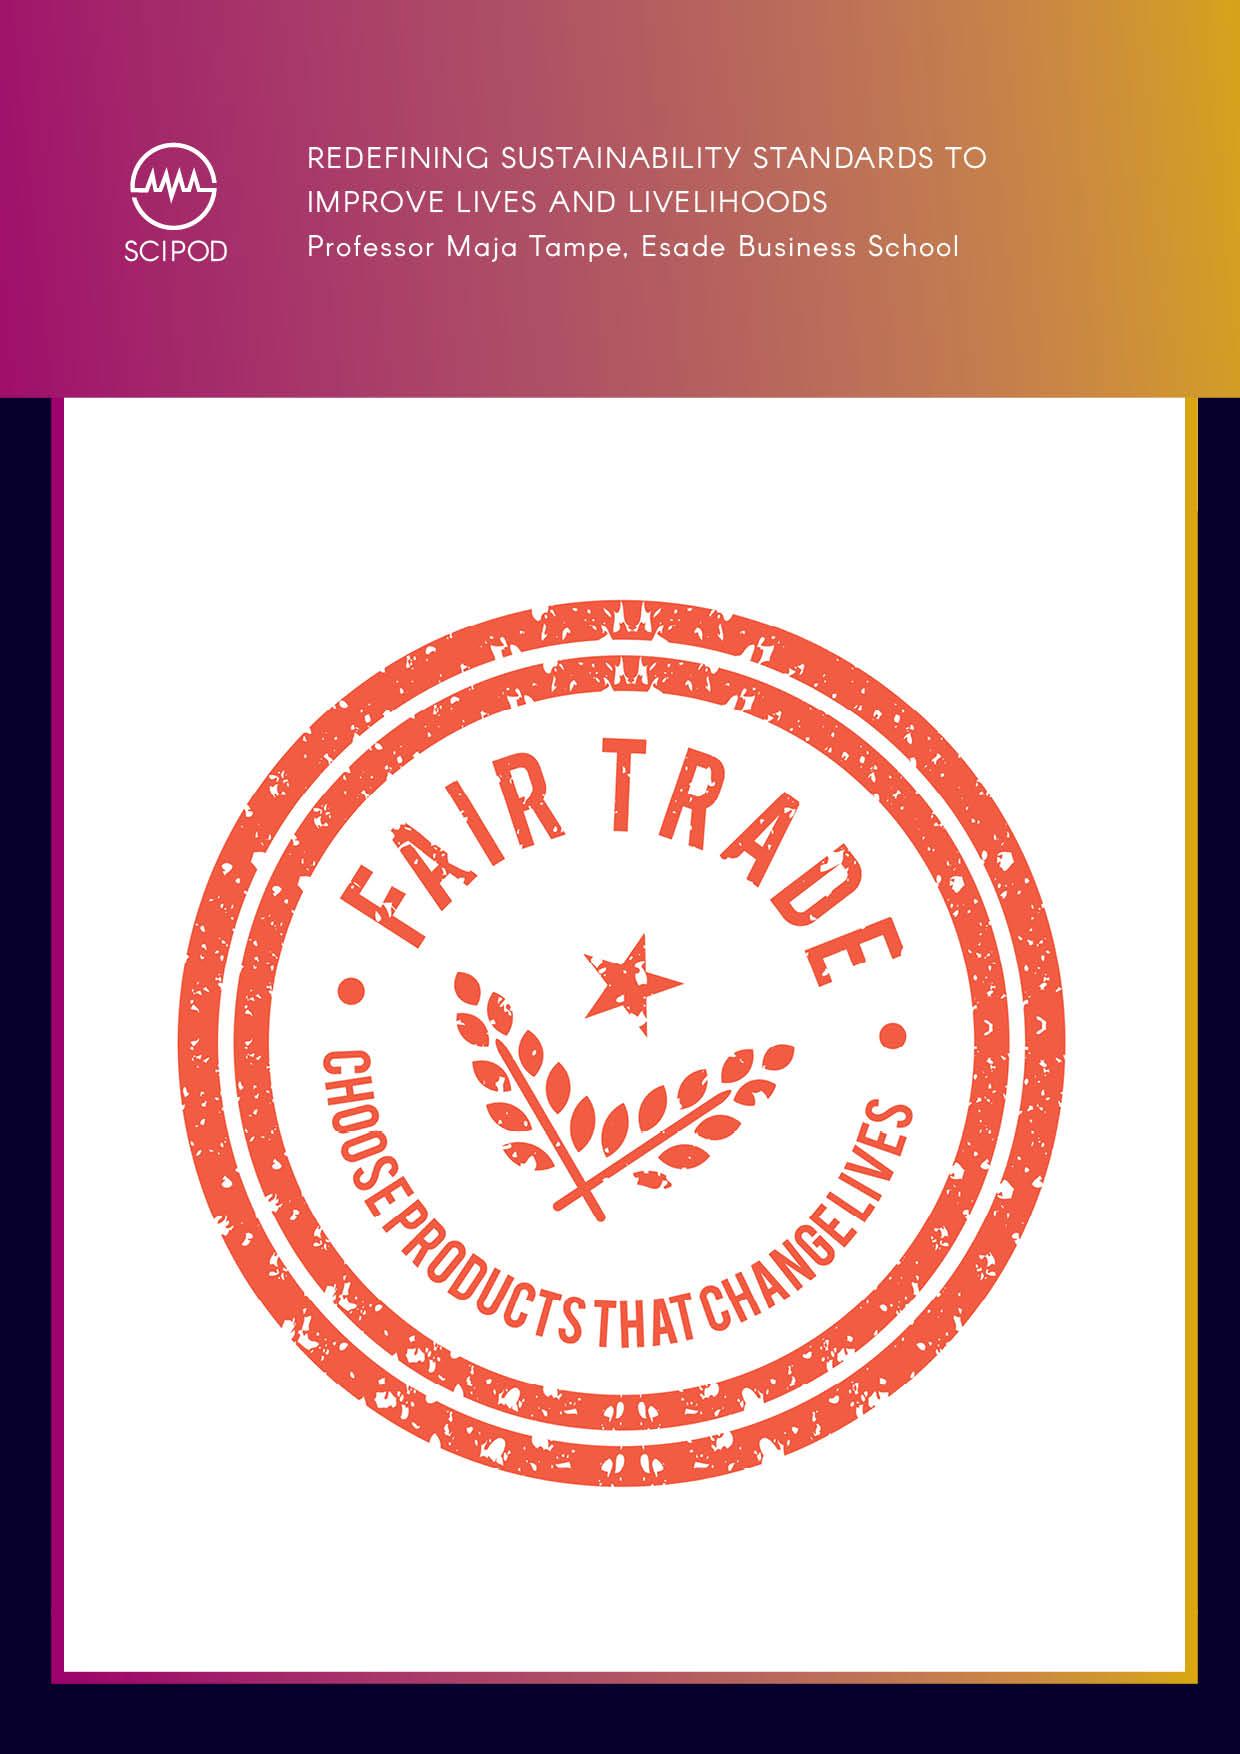 Redefining Sustainability Standards to Improve Lives and Livelihoods – Professor Maja Tampe, Esade business school